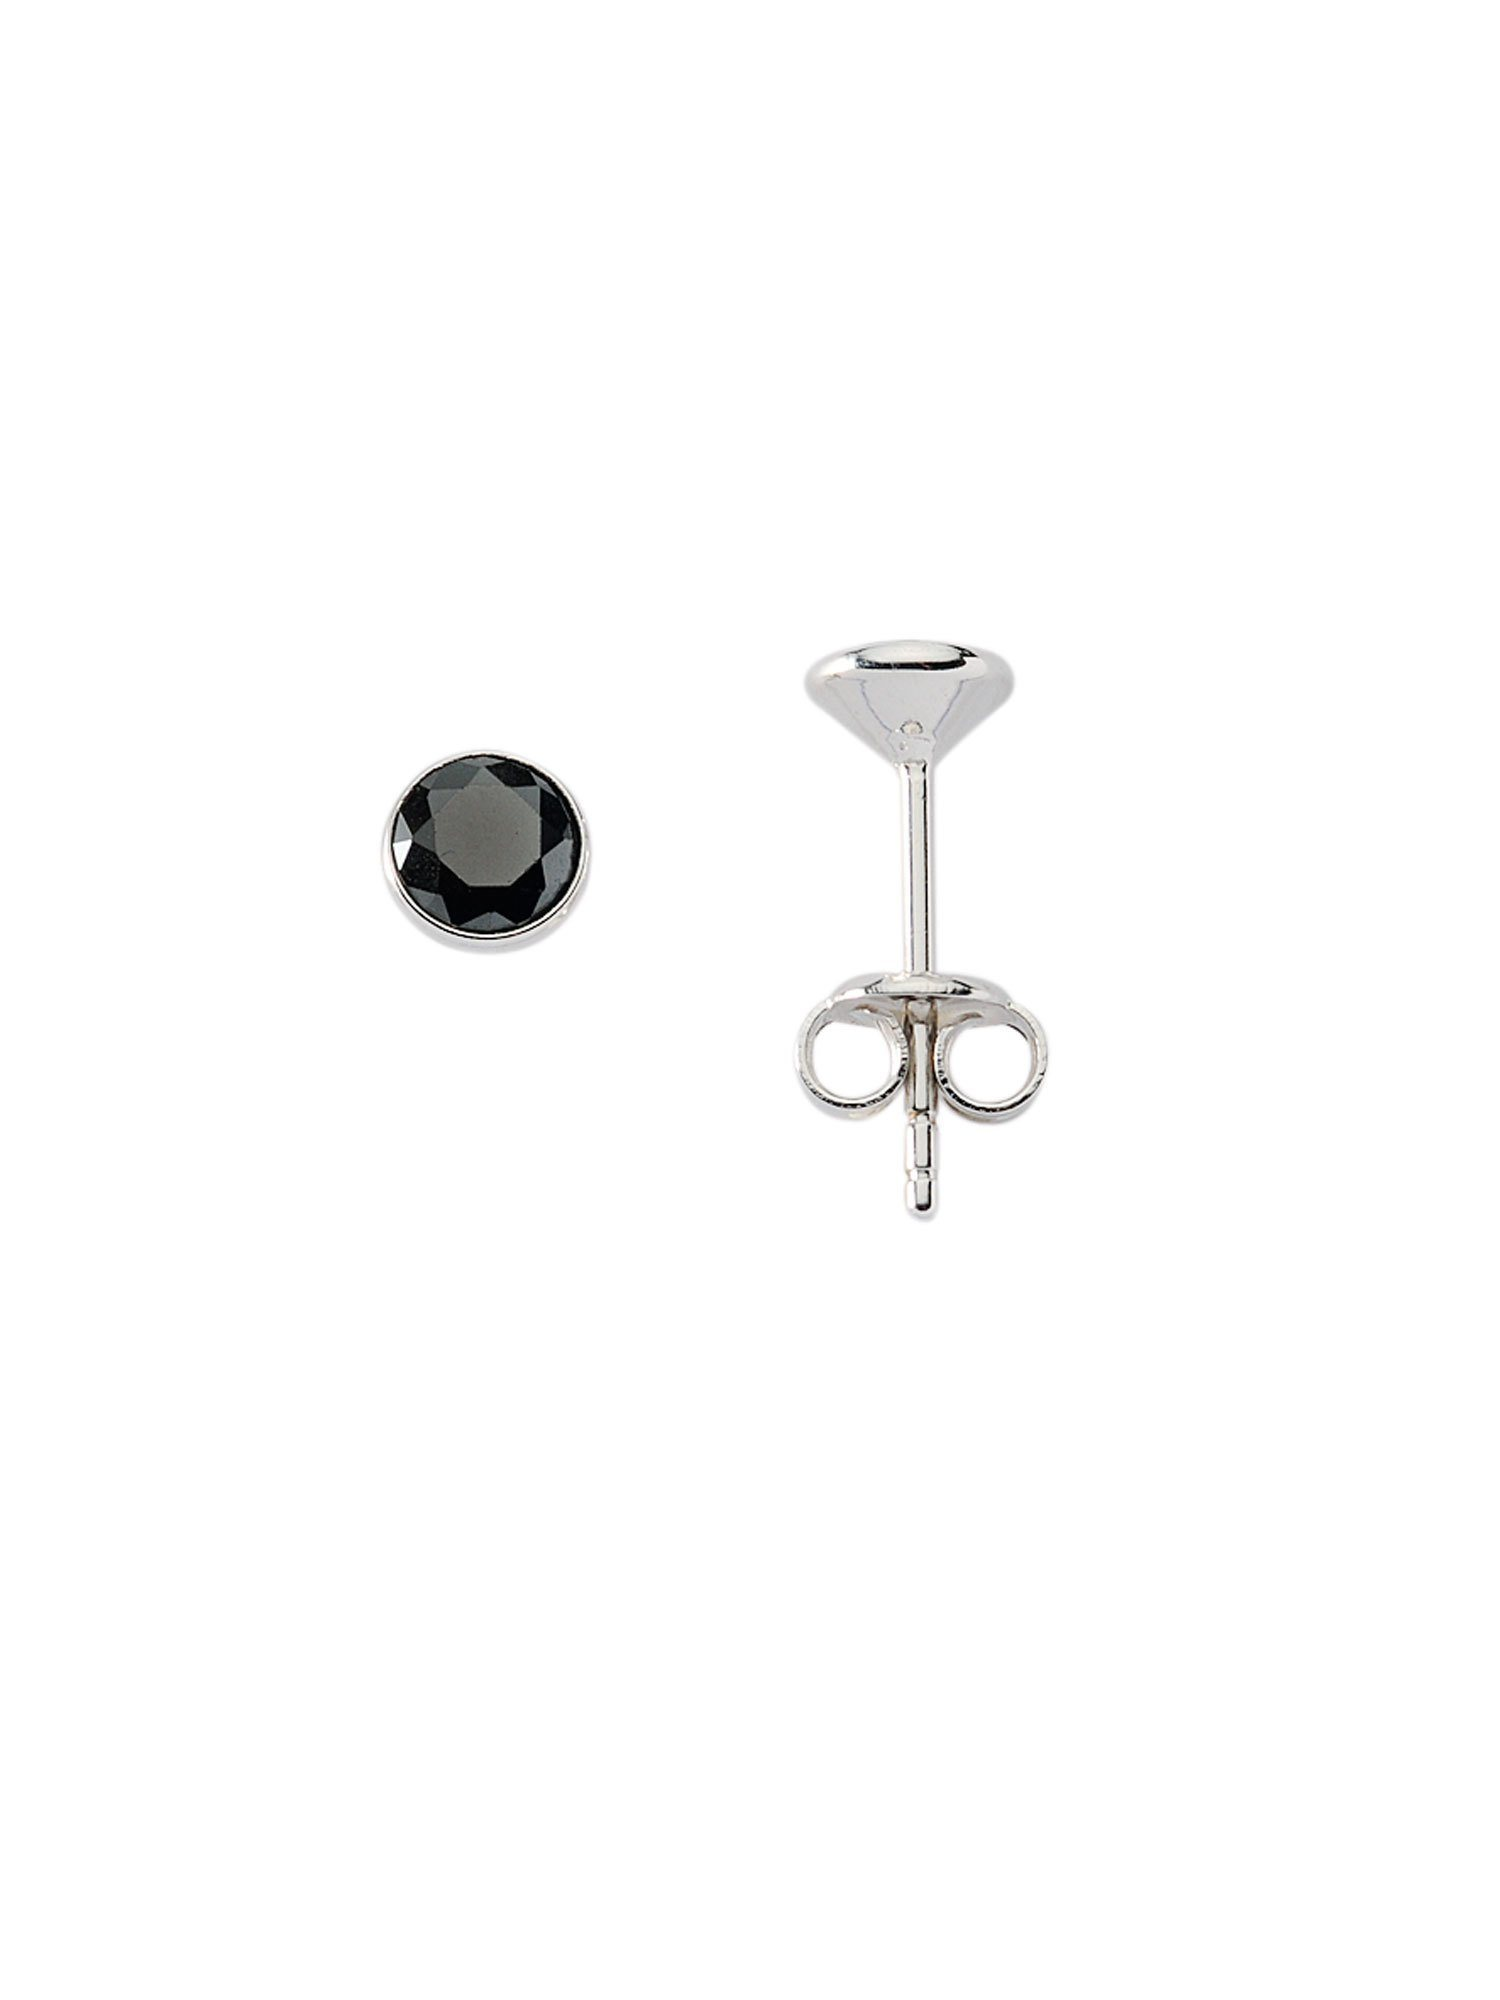 Adelia´s Paar Ohrstecker »Silber Ohrringe« 925 Sterling Silber mit Zirkonia Ø 6.6 mm   Schmuck > Ohrschmuck & Ohrringe > Ohrstecker   Bunt   Adelia´s